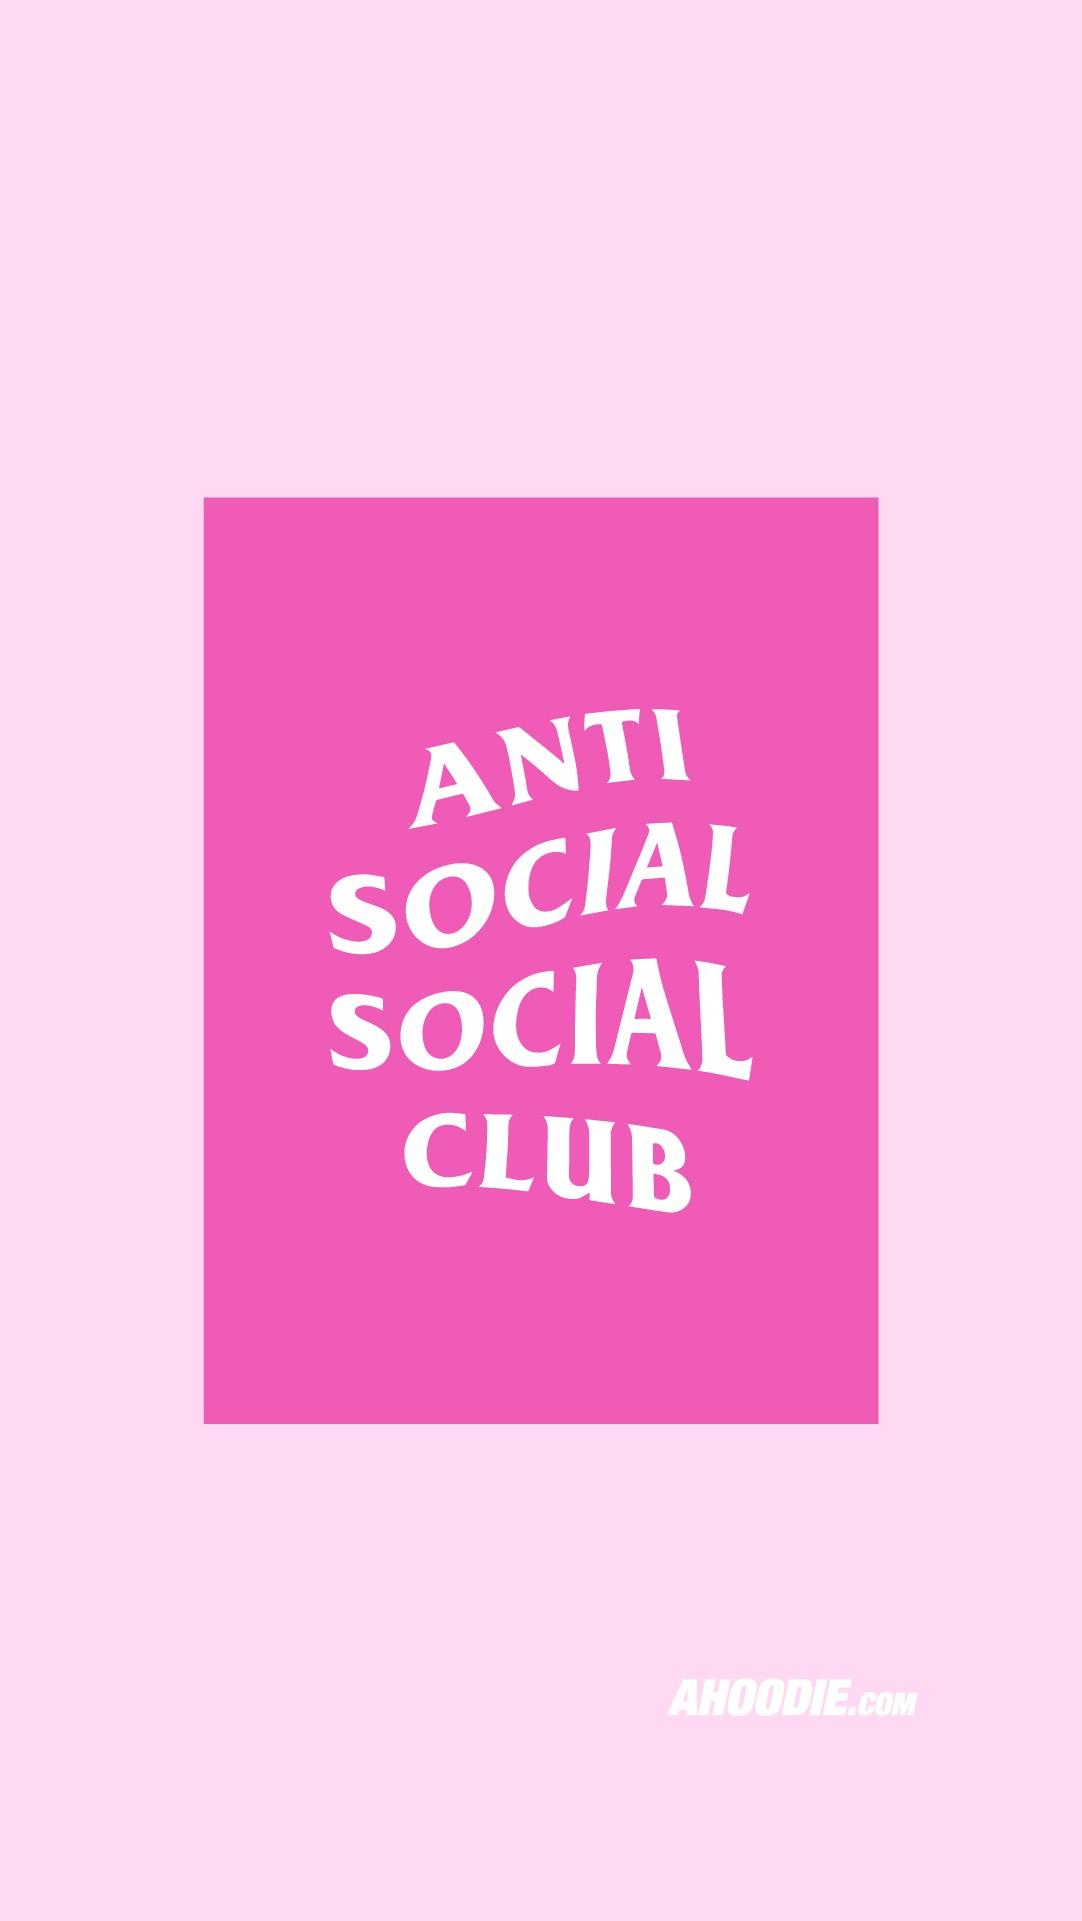 Anti Social Social Club pink wallpaper